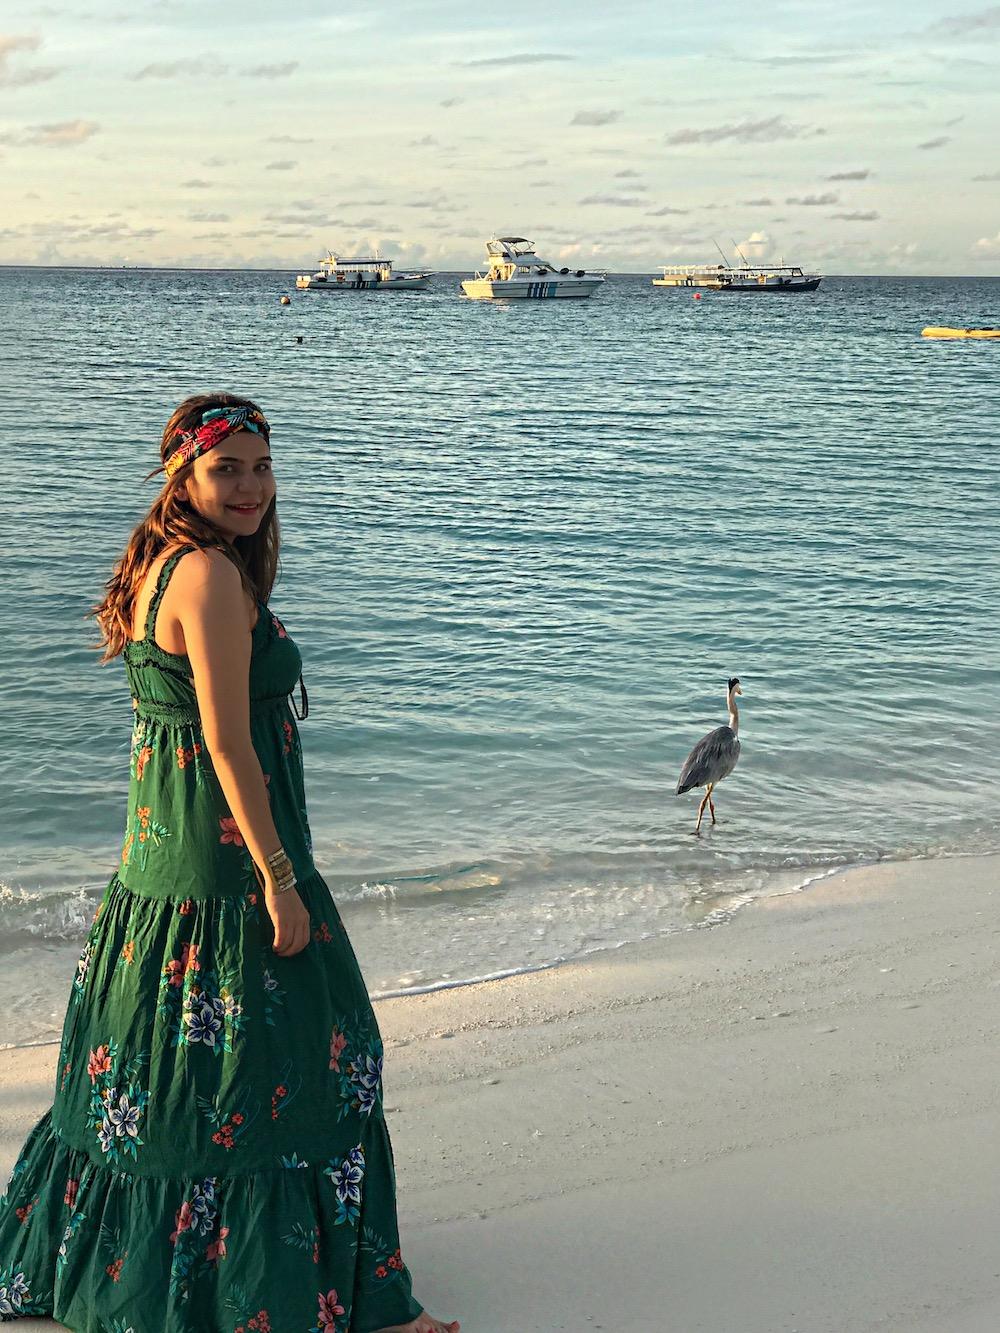 alley-girl-fashion-travel-life-style-blog-betul-yildiz-new-york